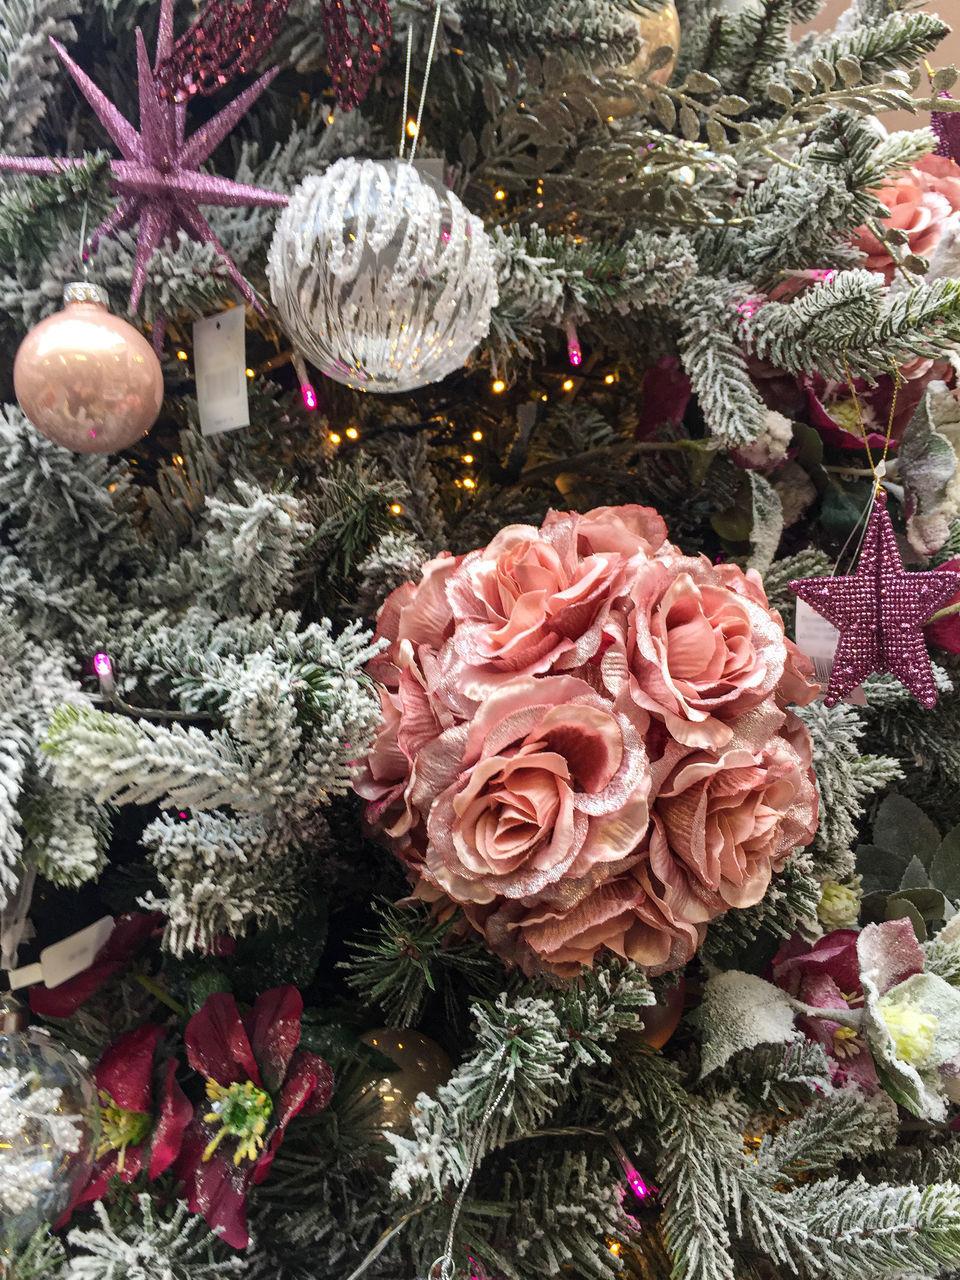 HIGH ANGLE VIEW OF CHRISTMAS DECORATION ON PLANT